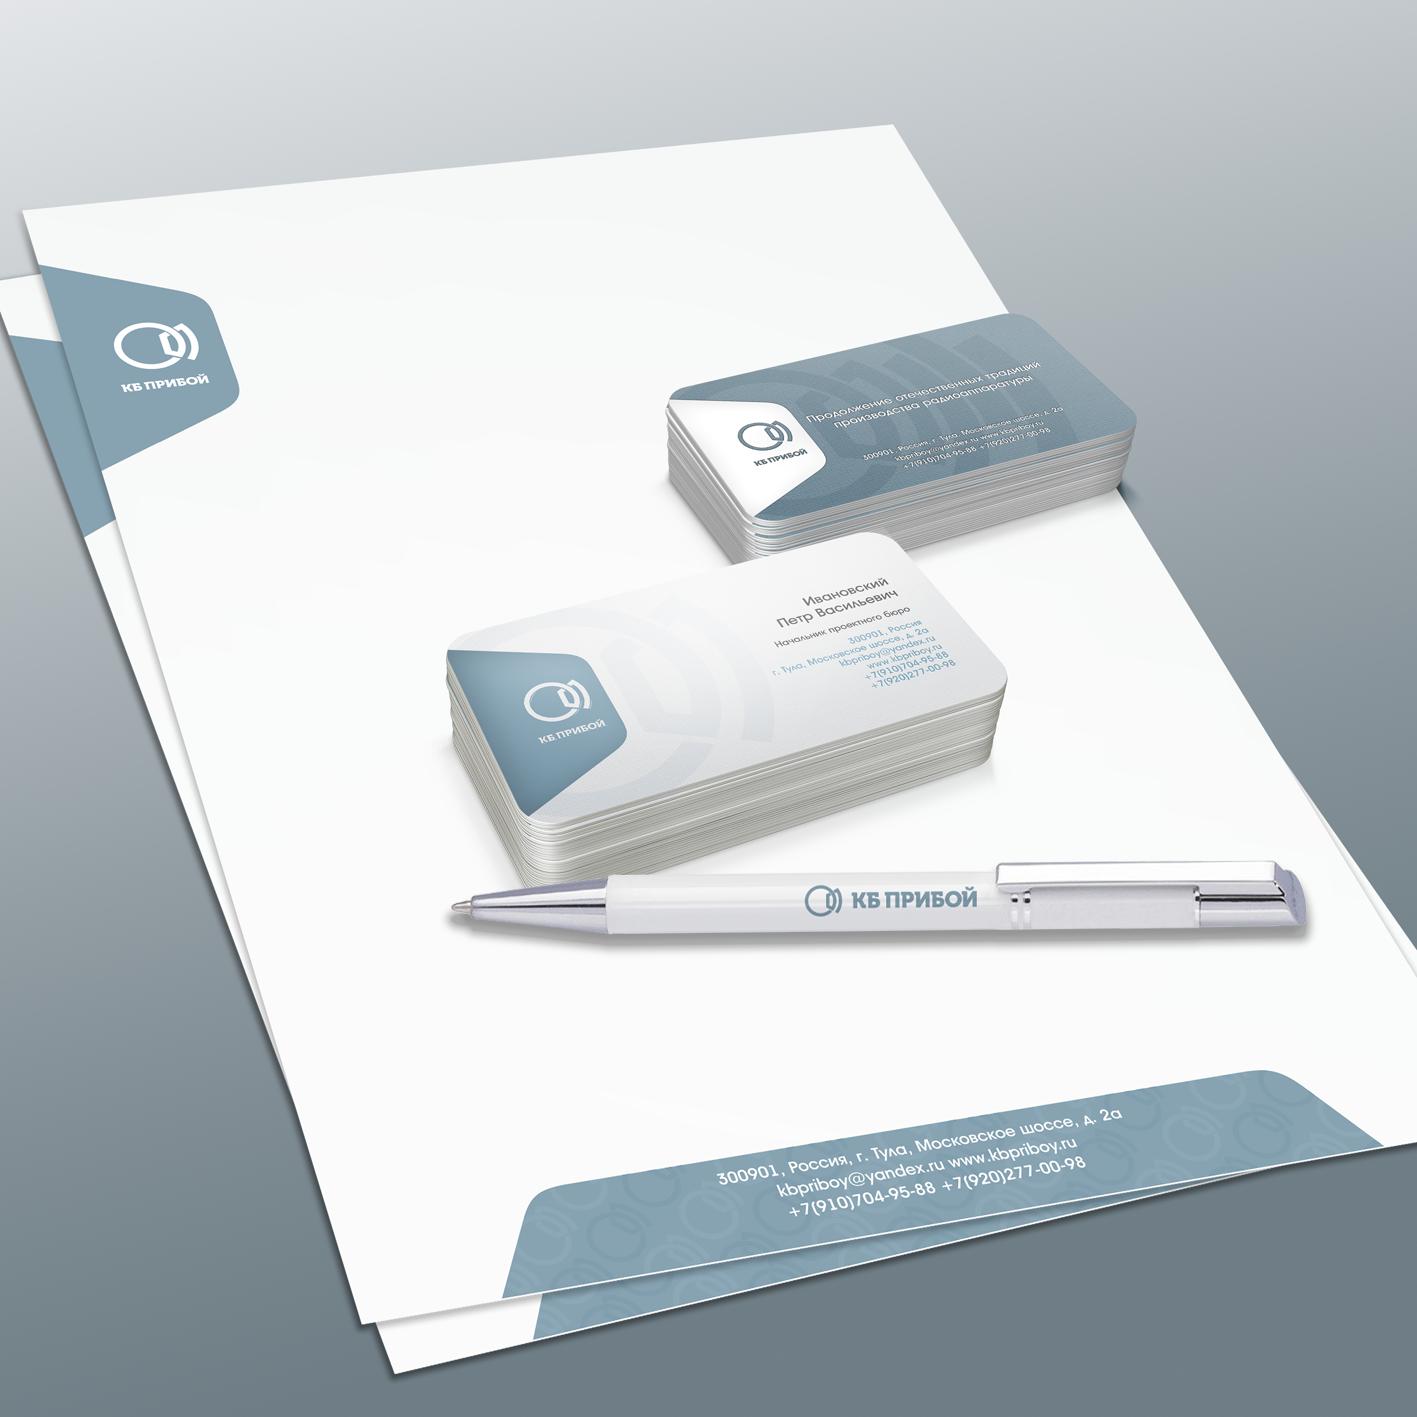 Разработка логотипа и фирменного стиля для КБ Прибой фото f_0065b293305ccf48.png